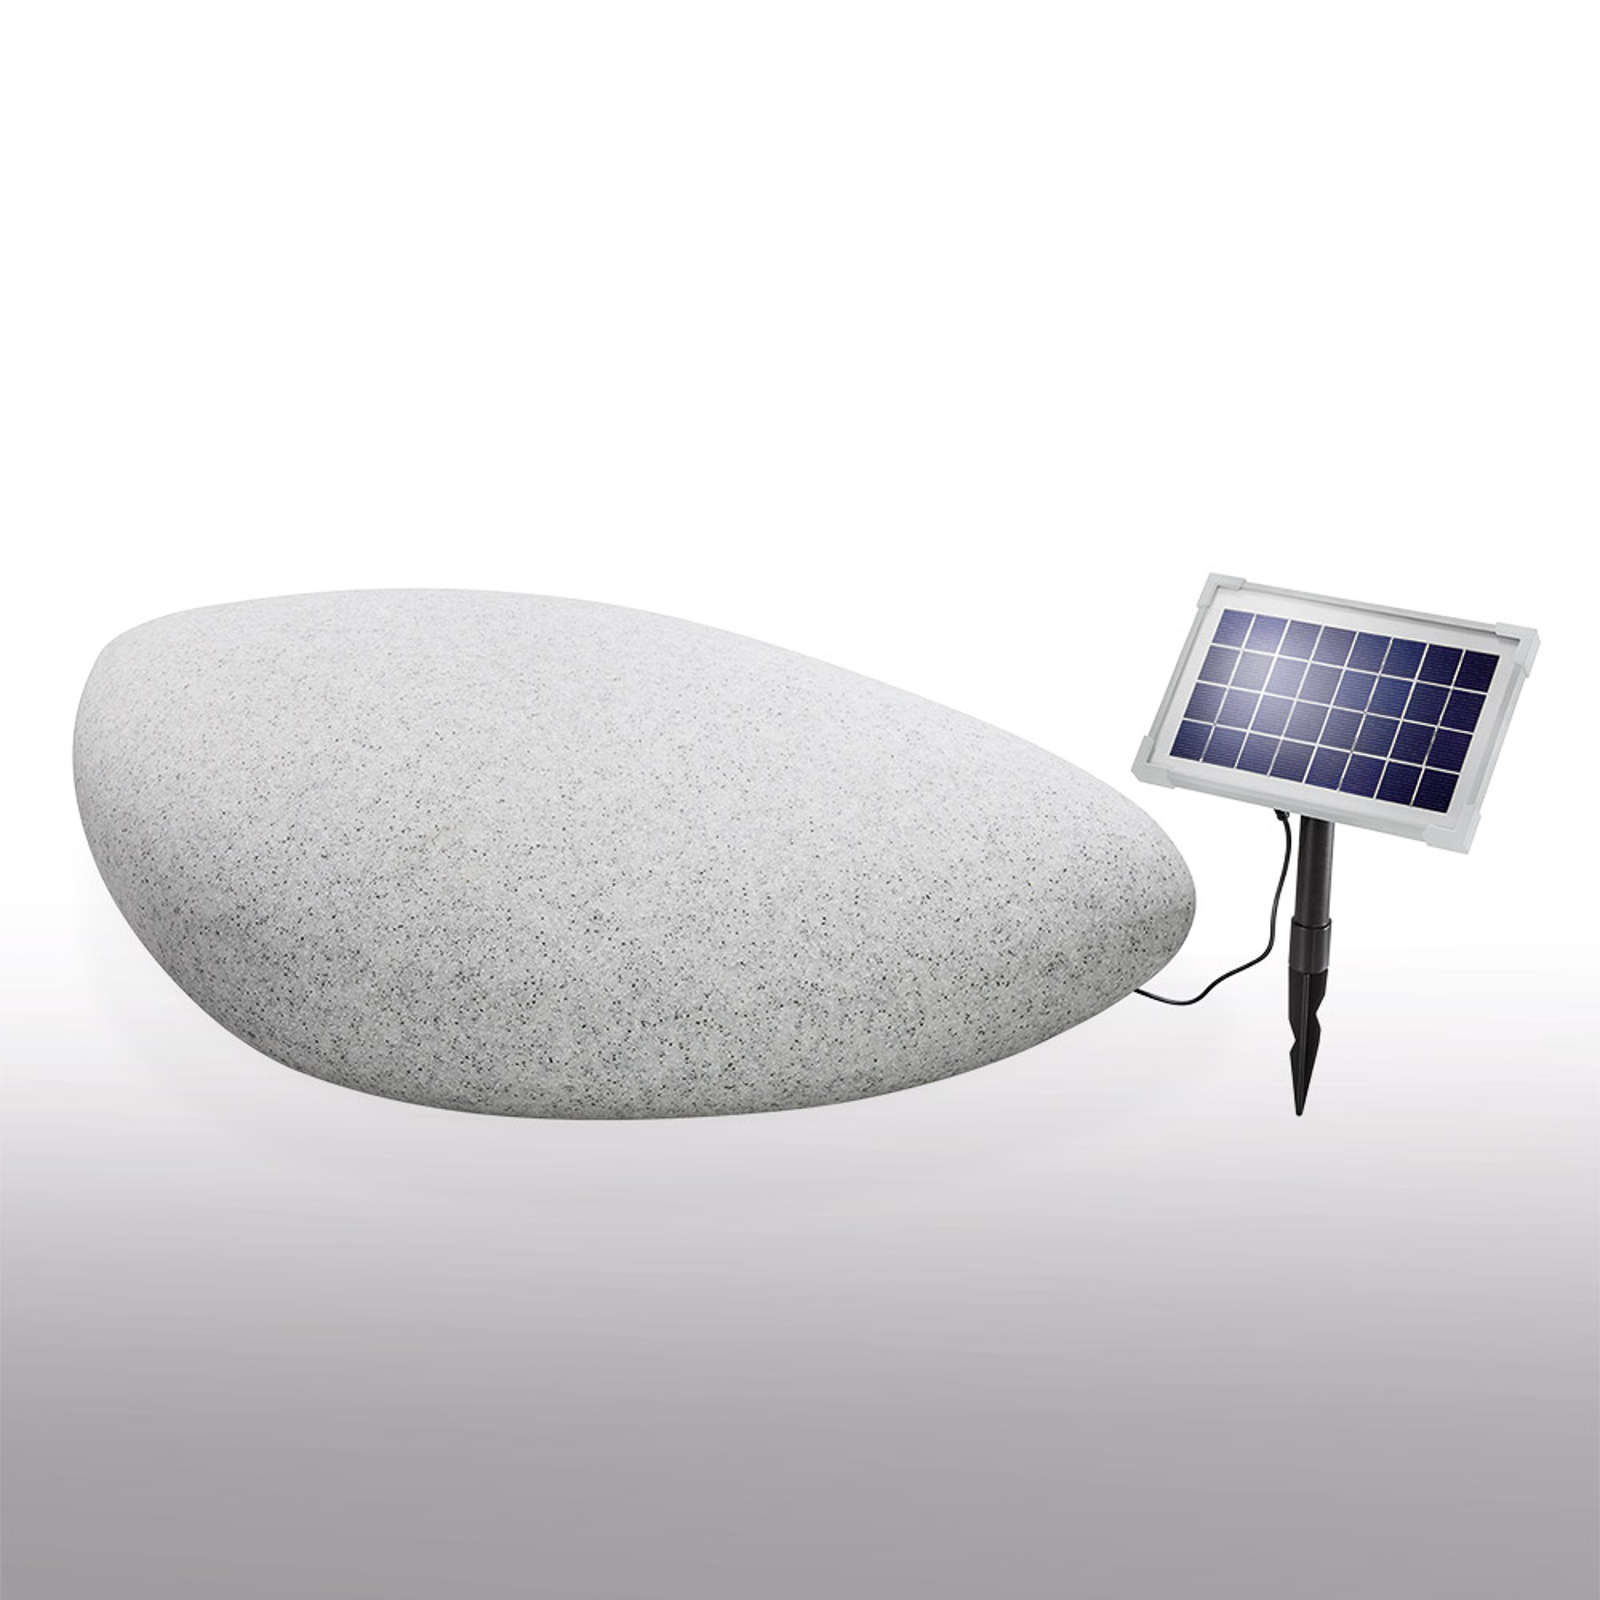 Außendekorationsleuchte Solar-LED Stone 40